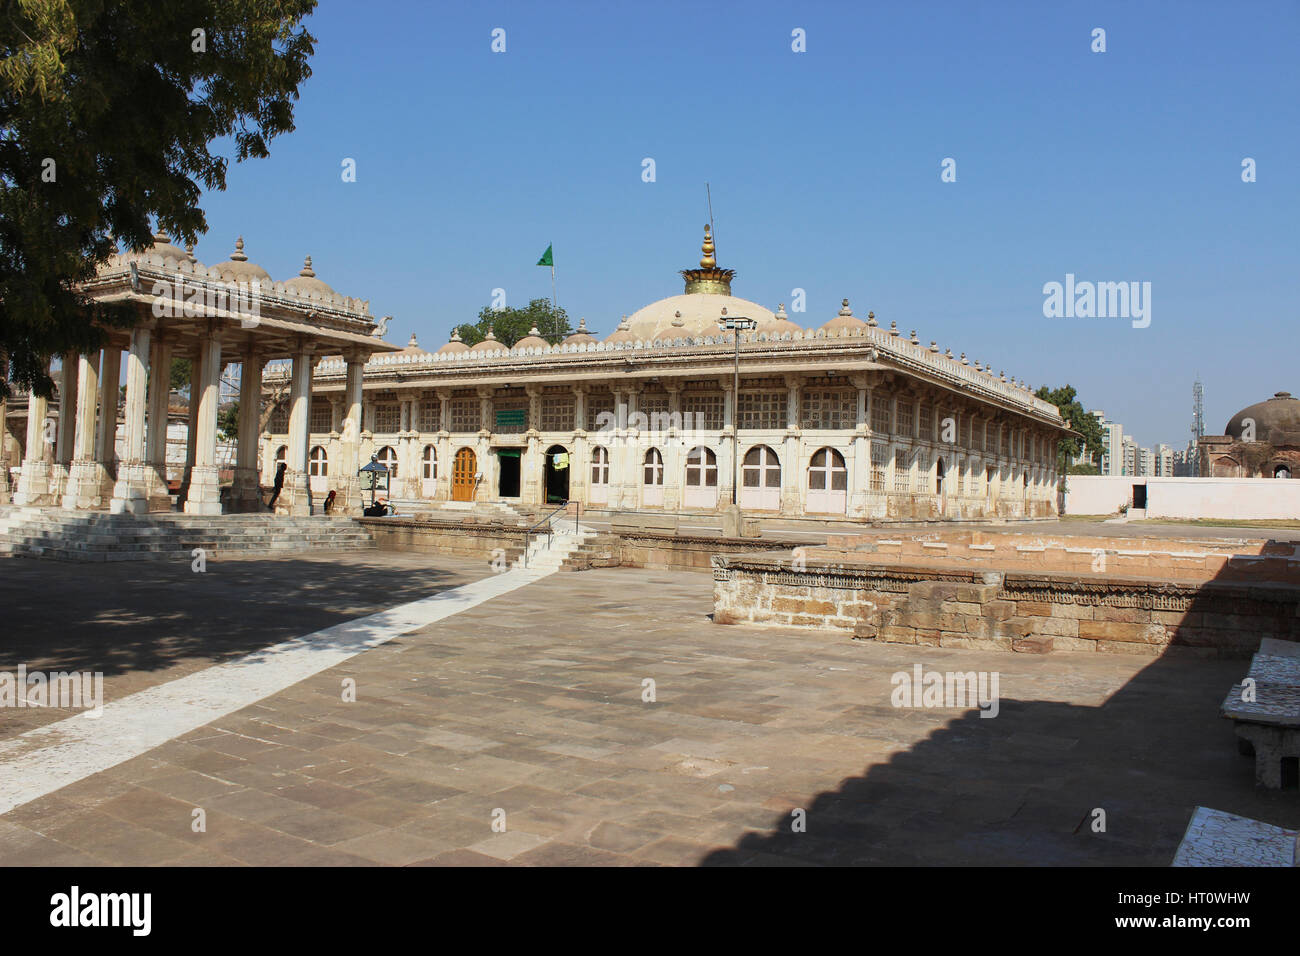 Courtyard pavilion at Sarkhej Roza, tomb complex, Ahmedabad, Gujarat. Tomb of Sheikh Ahmed Khattu Ganj Baksh - Stock Image